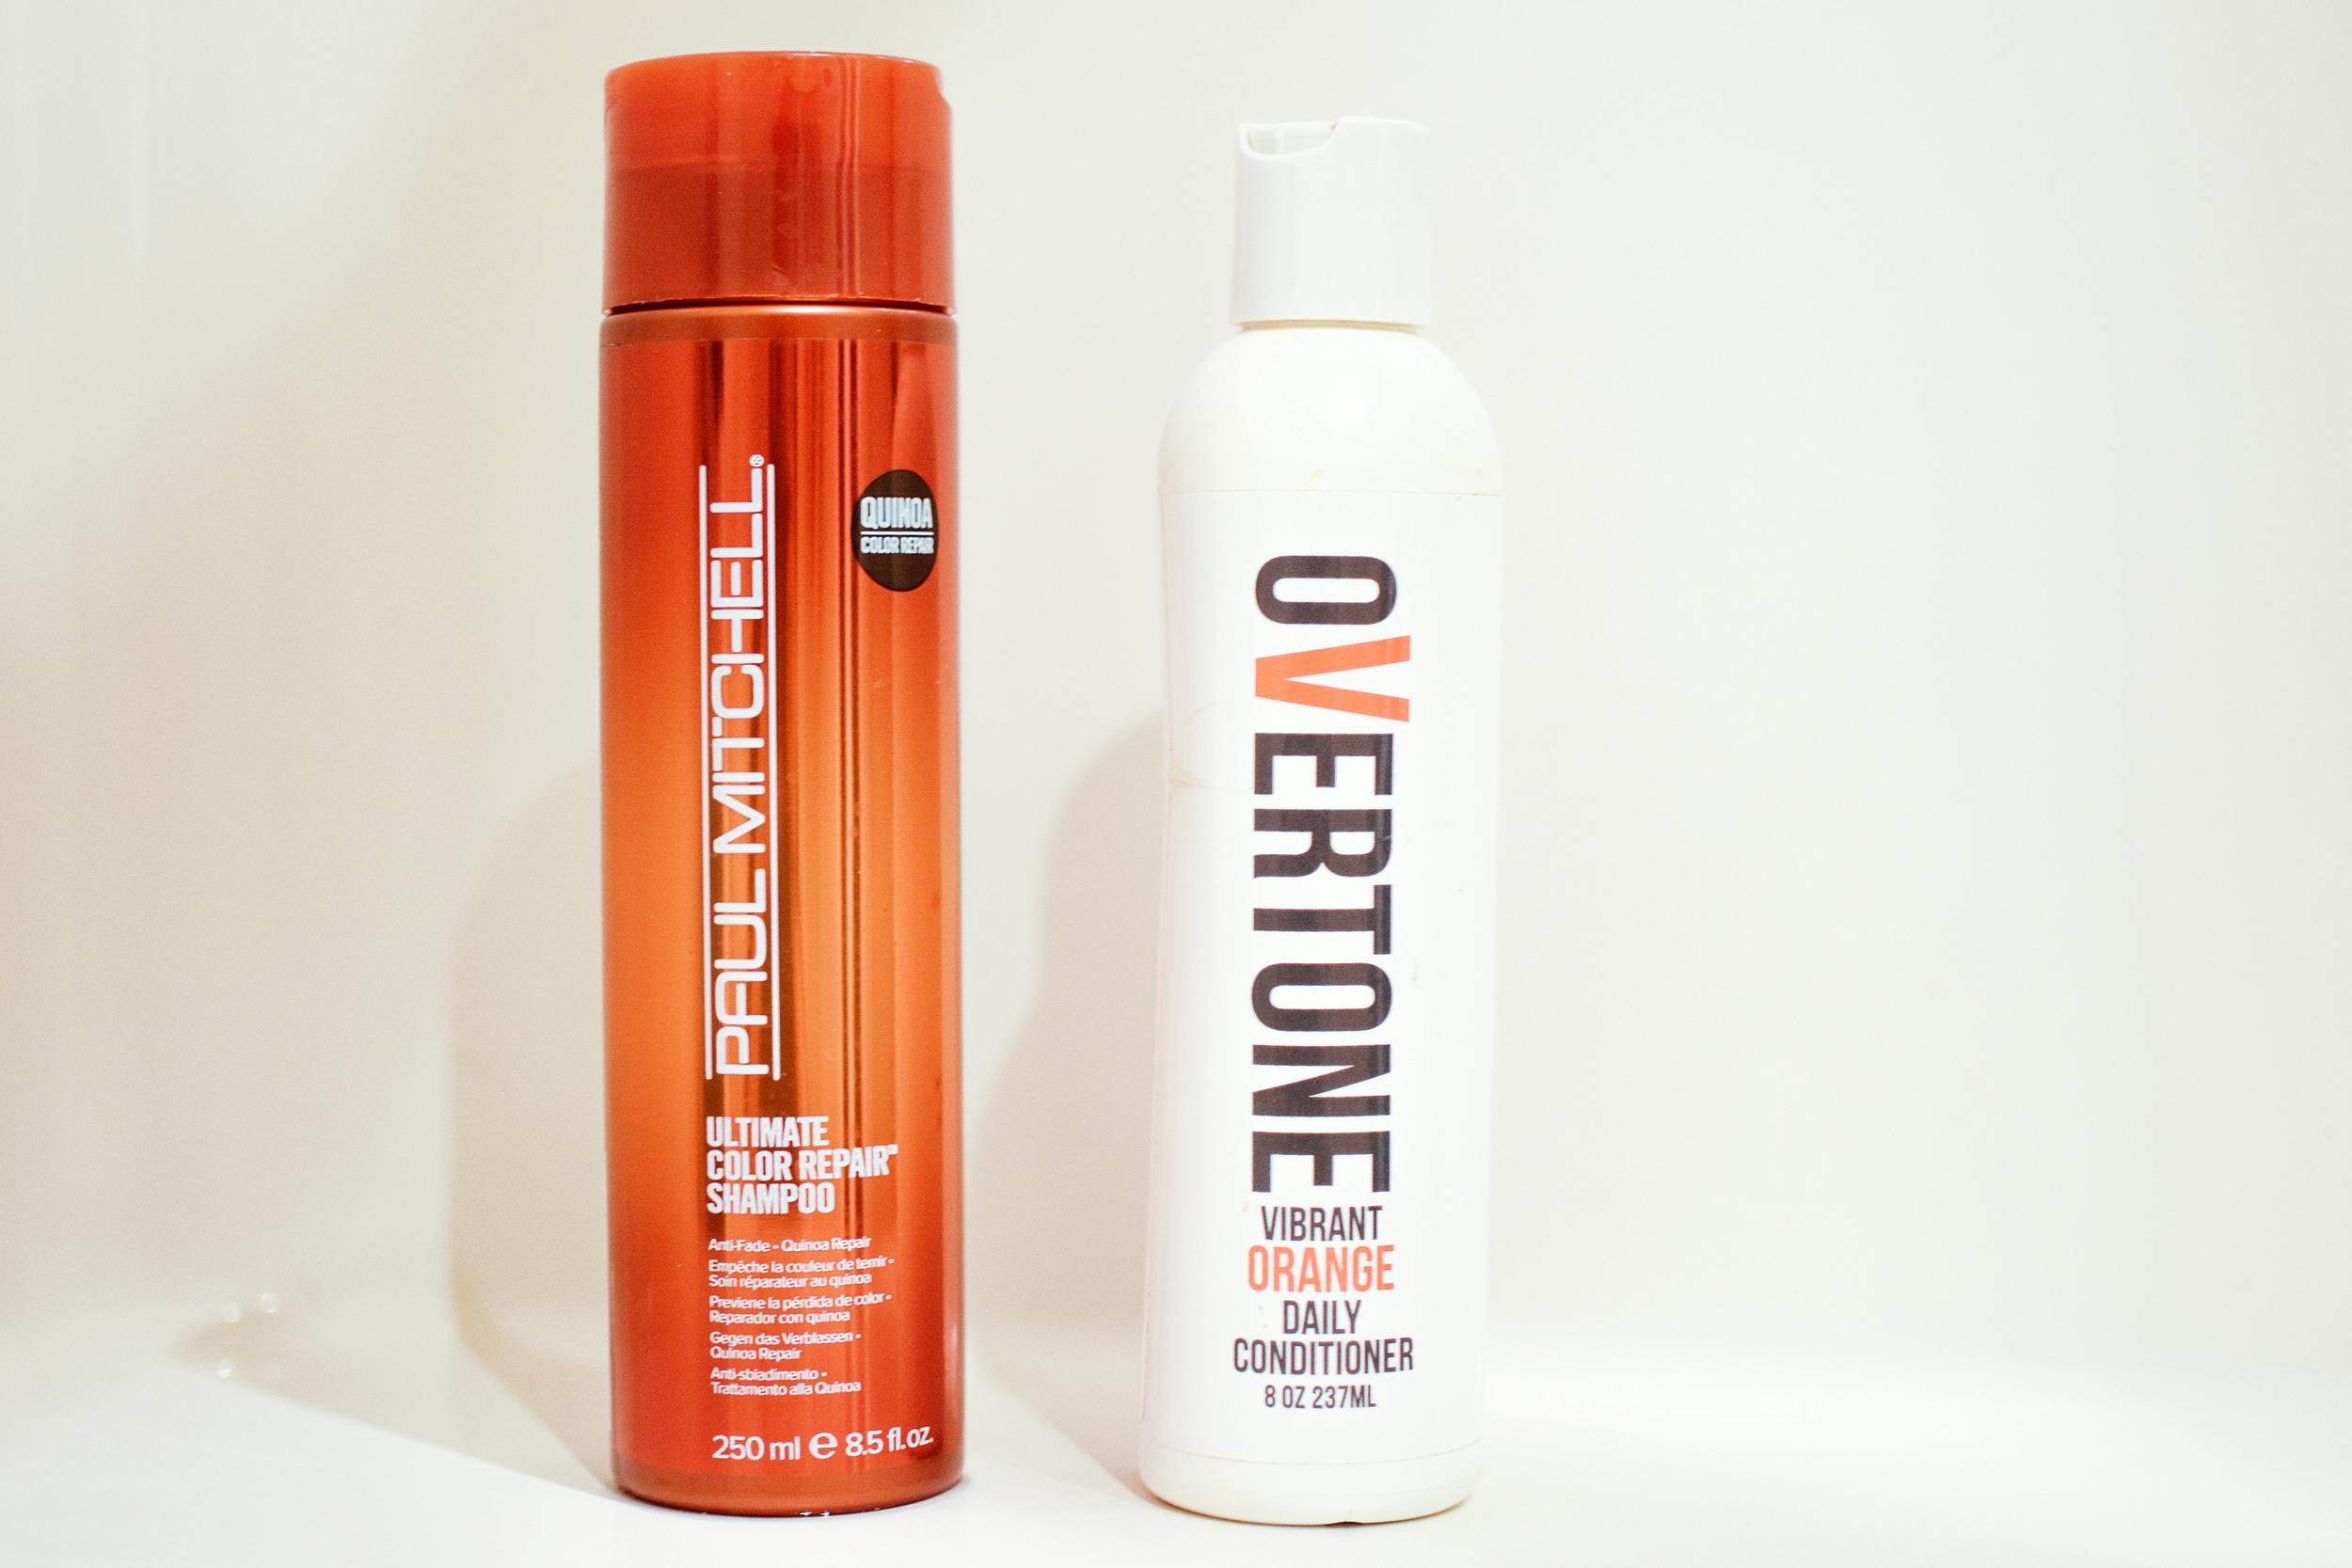 Paul Mitchel Color Repair Shampoo  and  Overtone Vibrant Orange conditioner